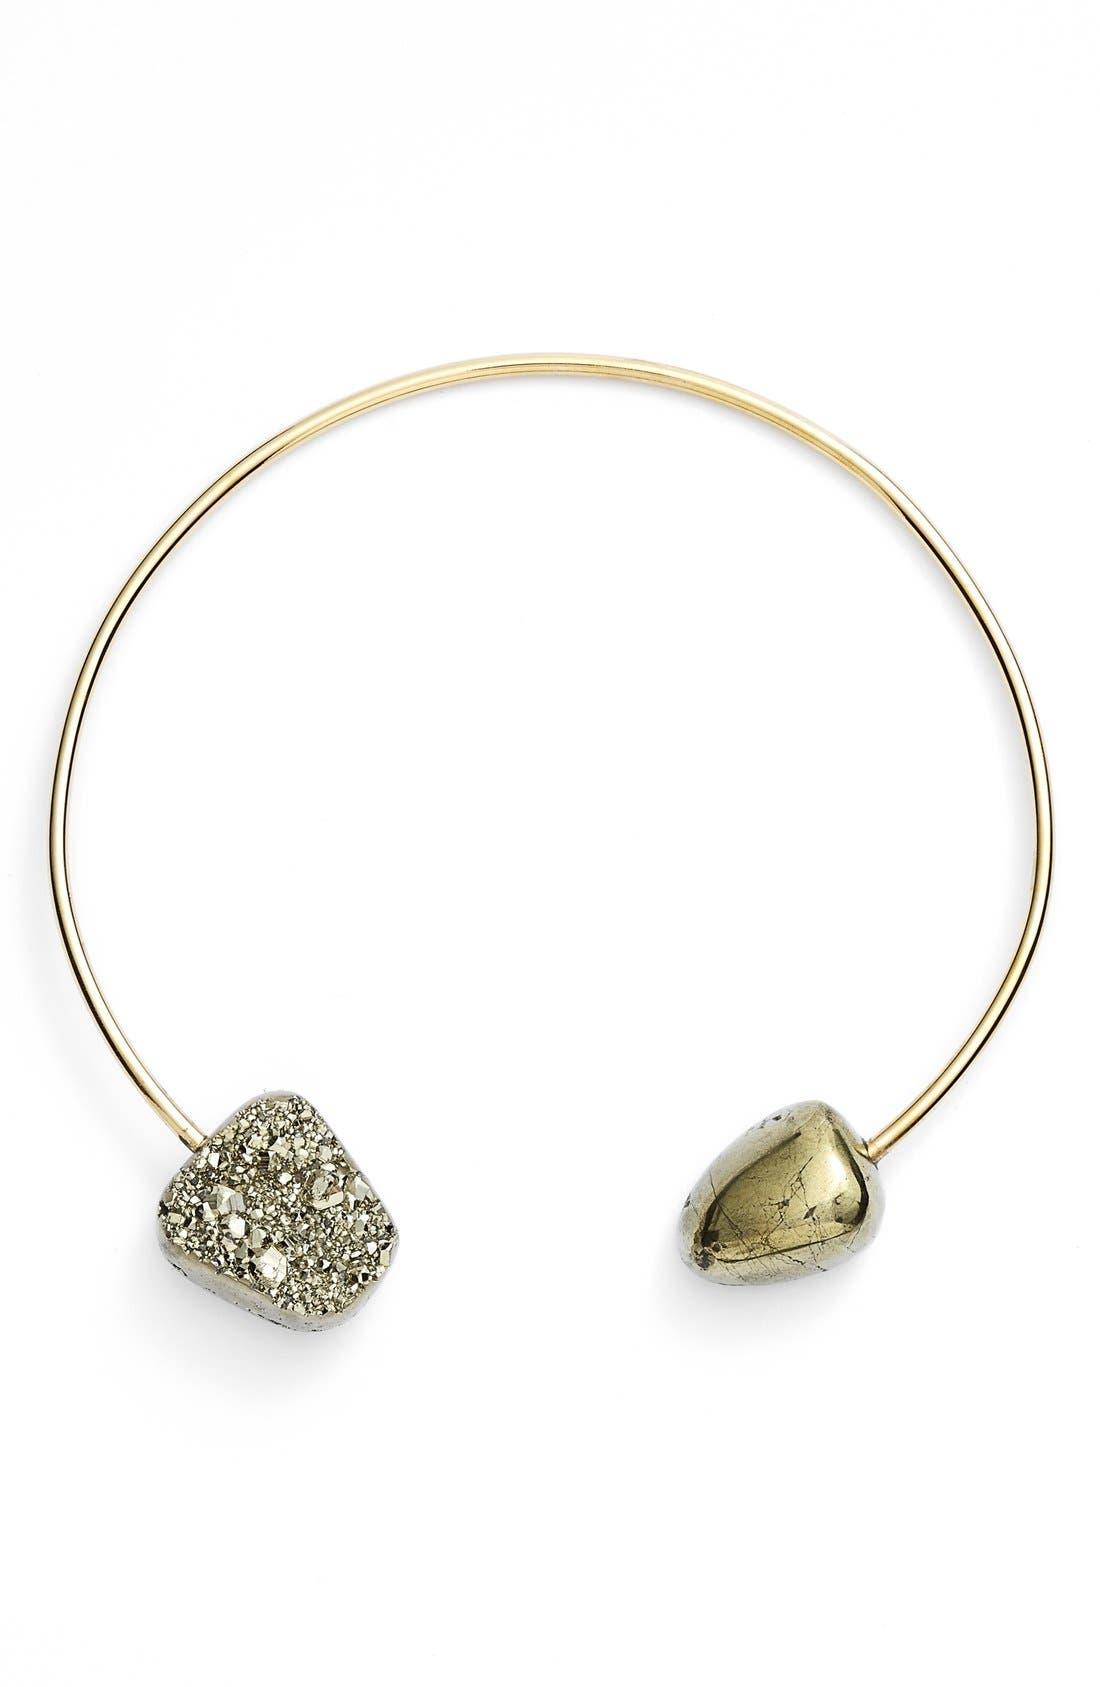 Alternate Image 1 Selected - Seraphine Design Pyrite & Semiprecious Stone Collar Necklace